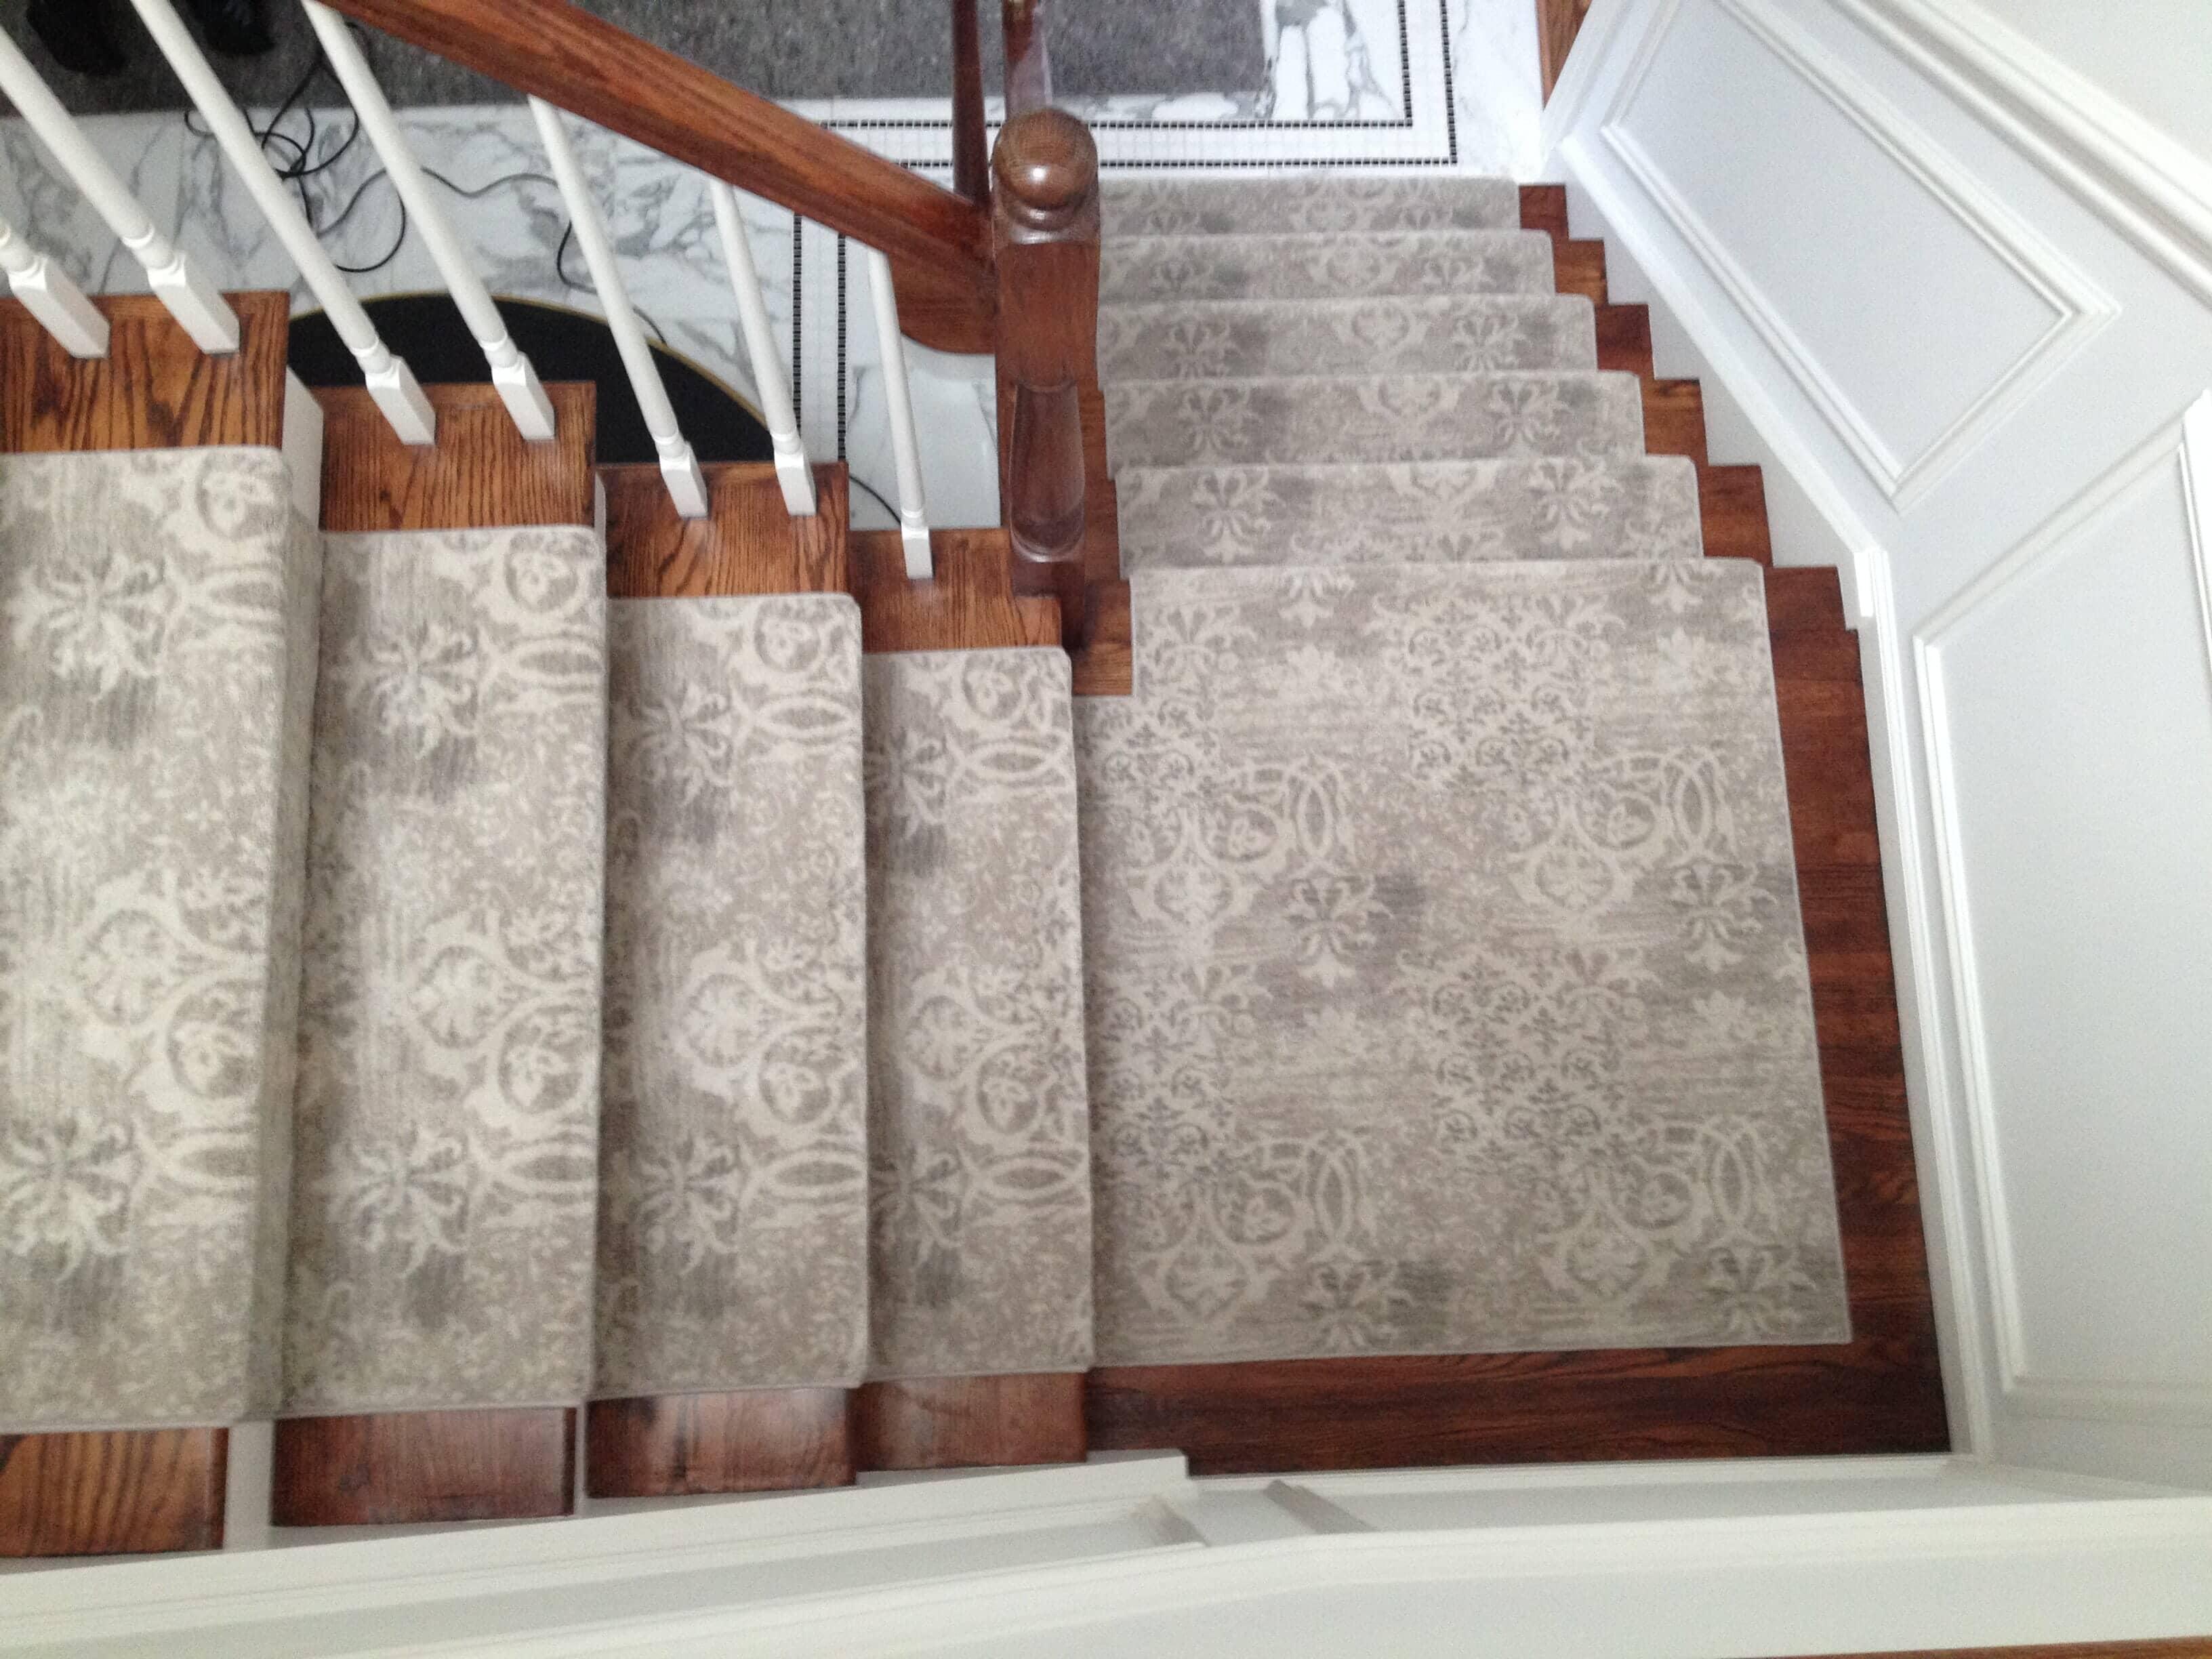 Custom Hallway & Stair Runners in Wyckoff, NJ from G. Fried Flooring & Design